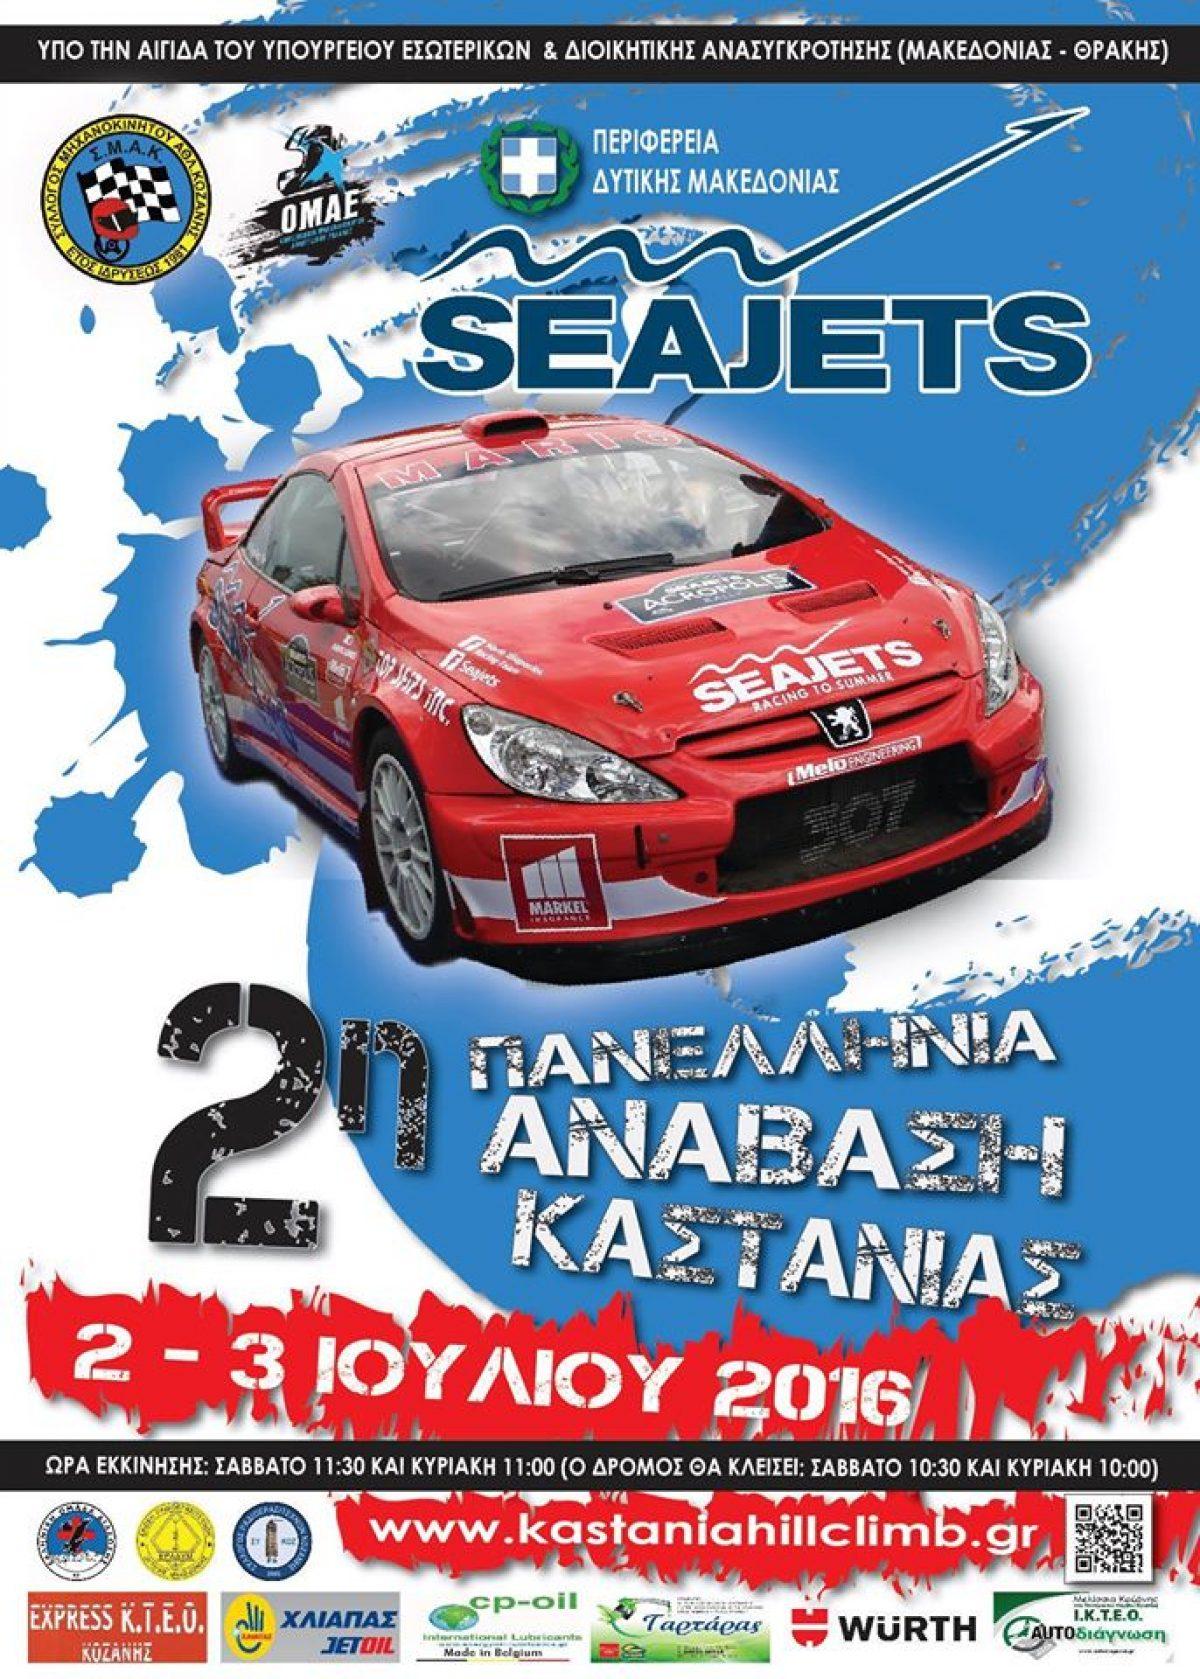 SEAJETS Ανάβαση Καστανιάς 2016: Συμμετοχές